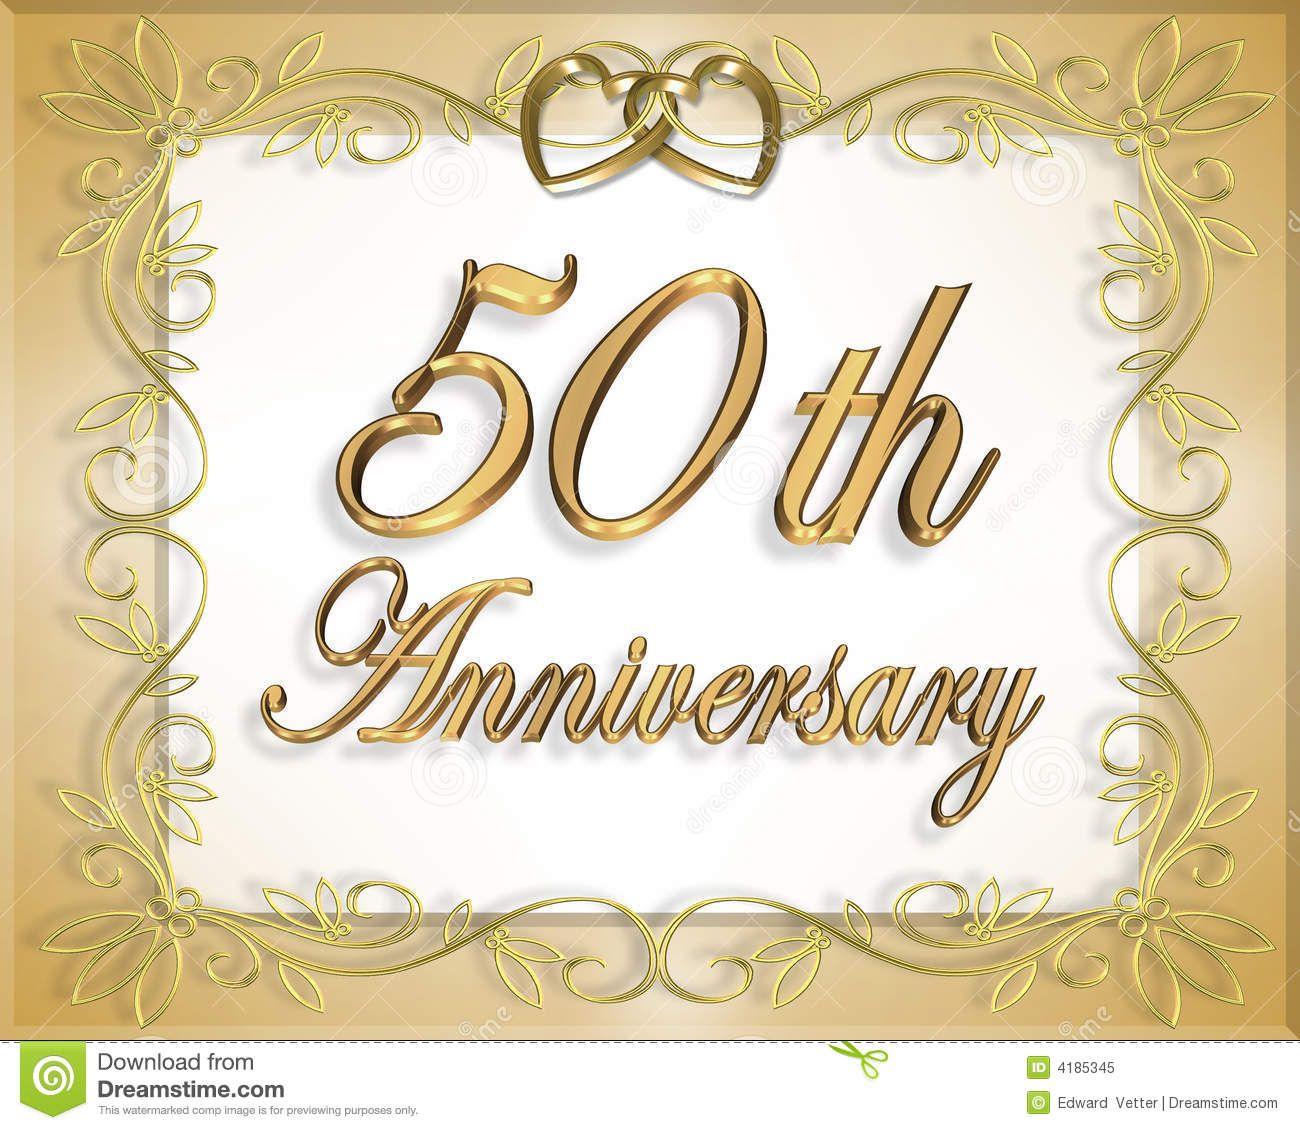 50th Wedding Anniversary Card Royalty Free Stock Image